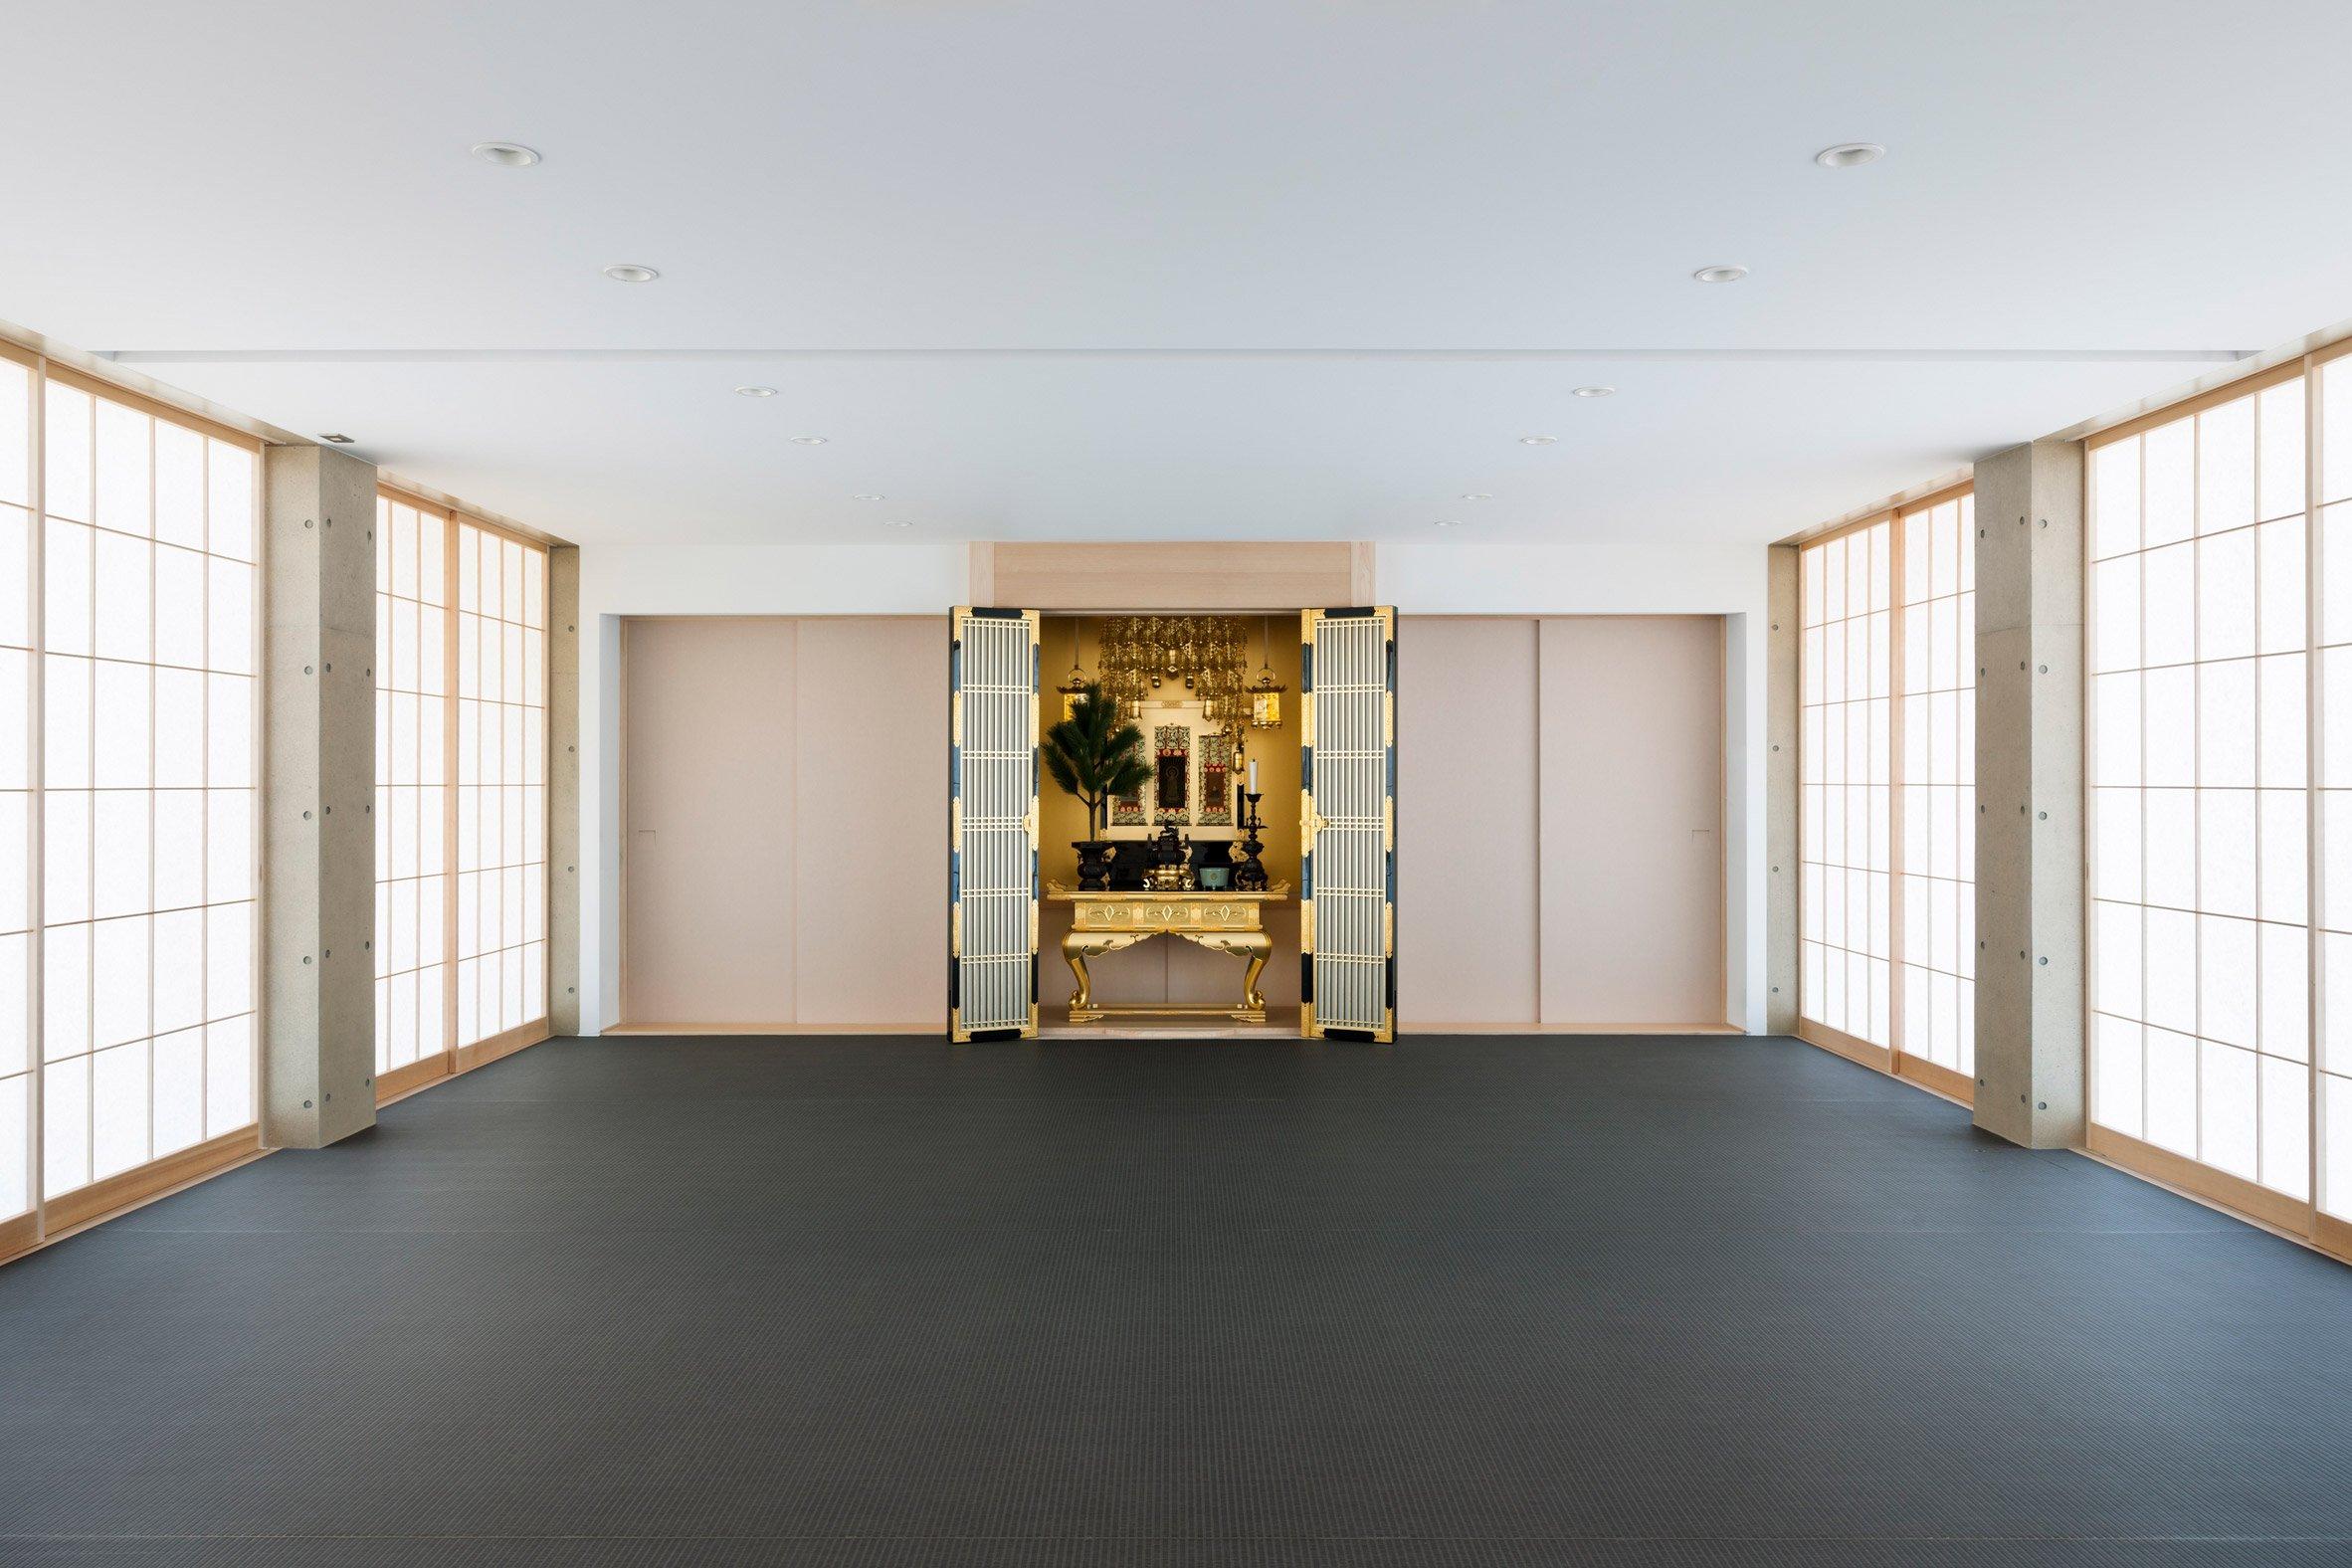 Shoraku-Ji, a Buddhist Temple by Toru Kashihara in Tokyo, Japan